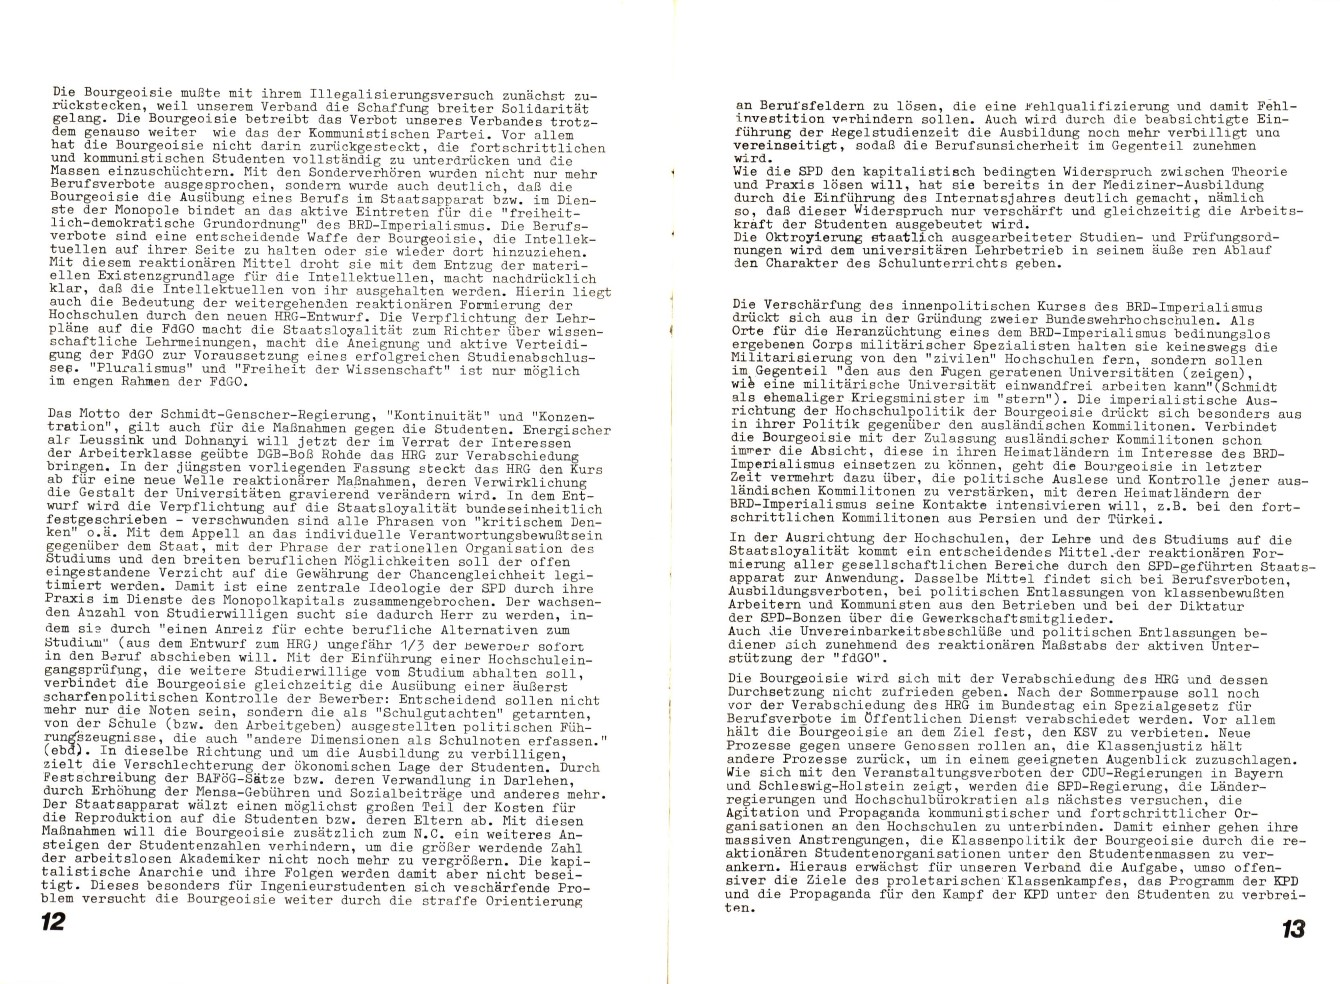 KSV_1974_Rechenschaftsbericht_08